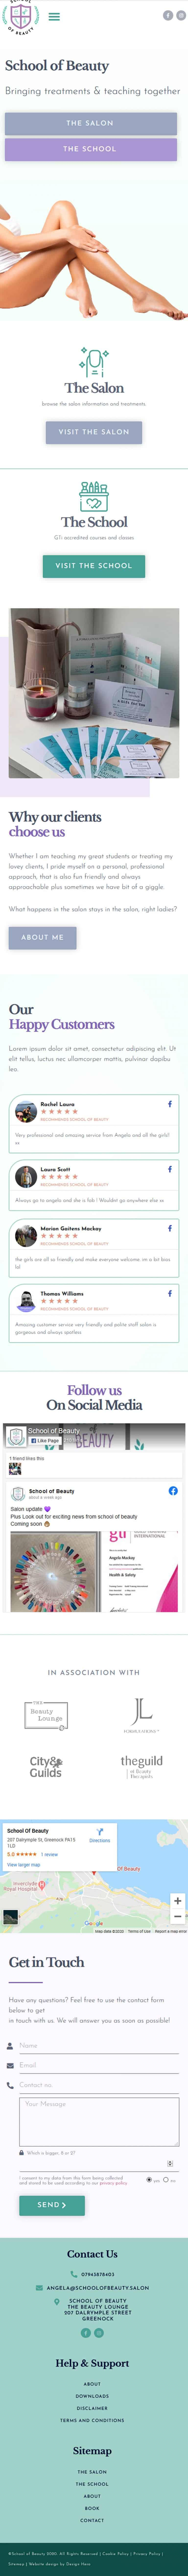 Mobile website design for Beauty Salon